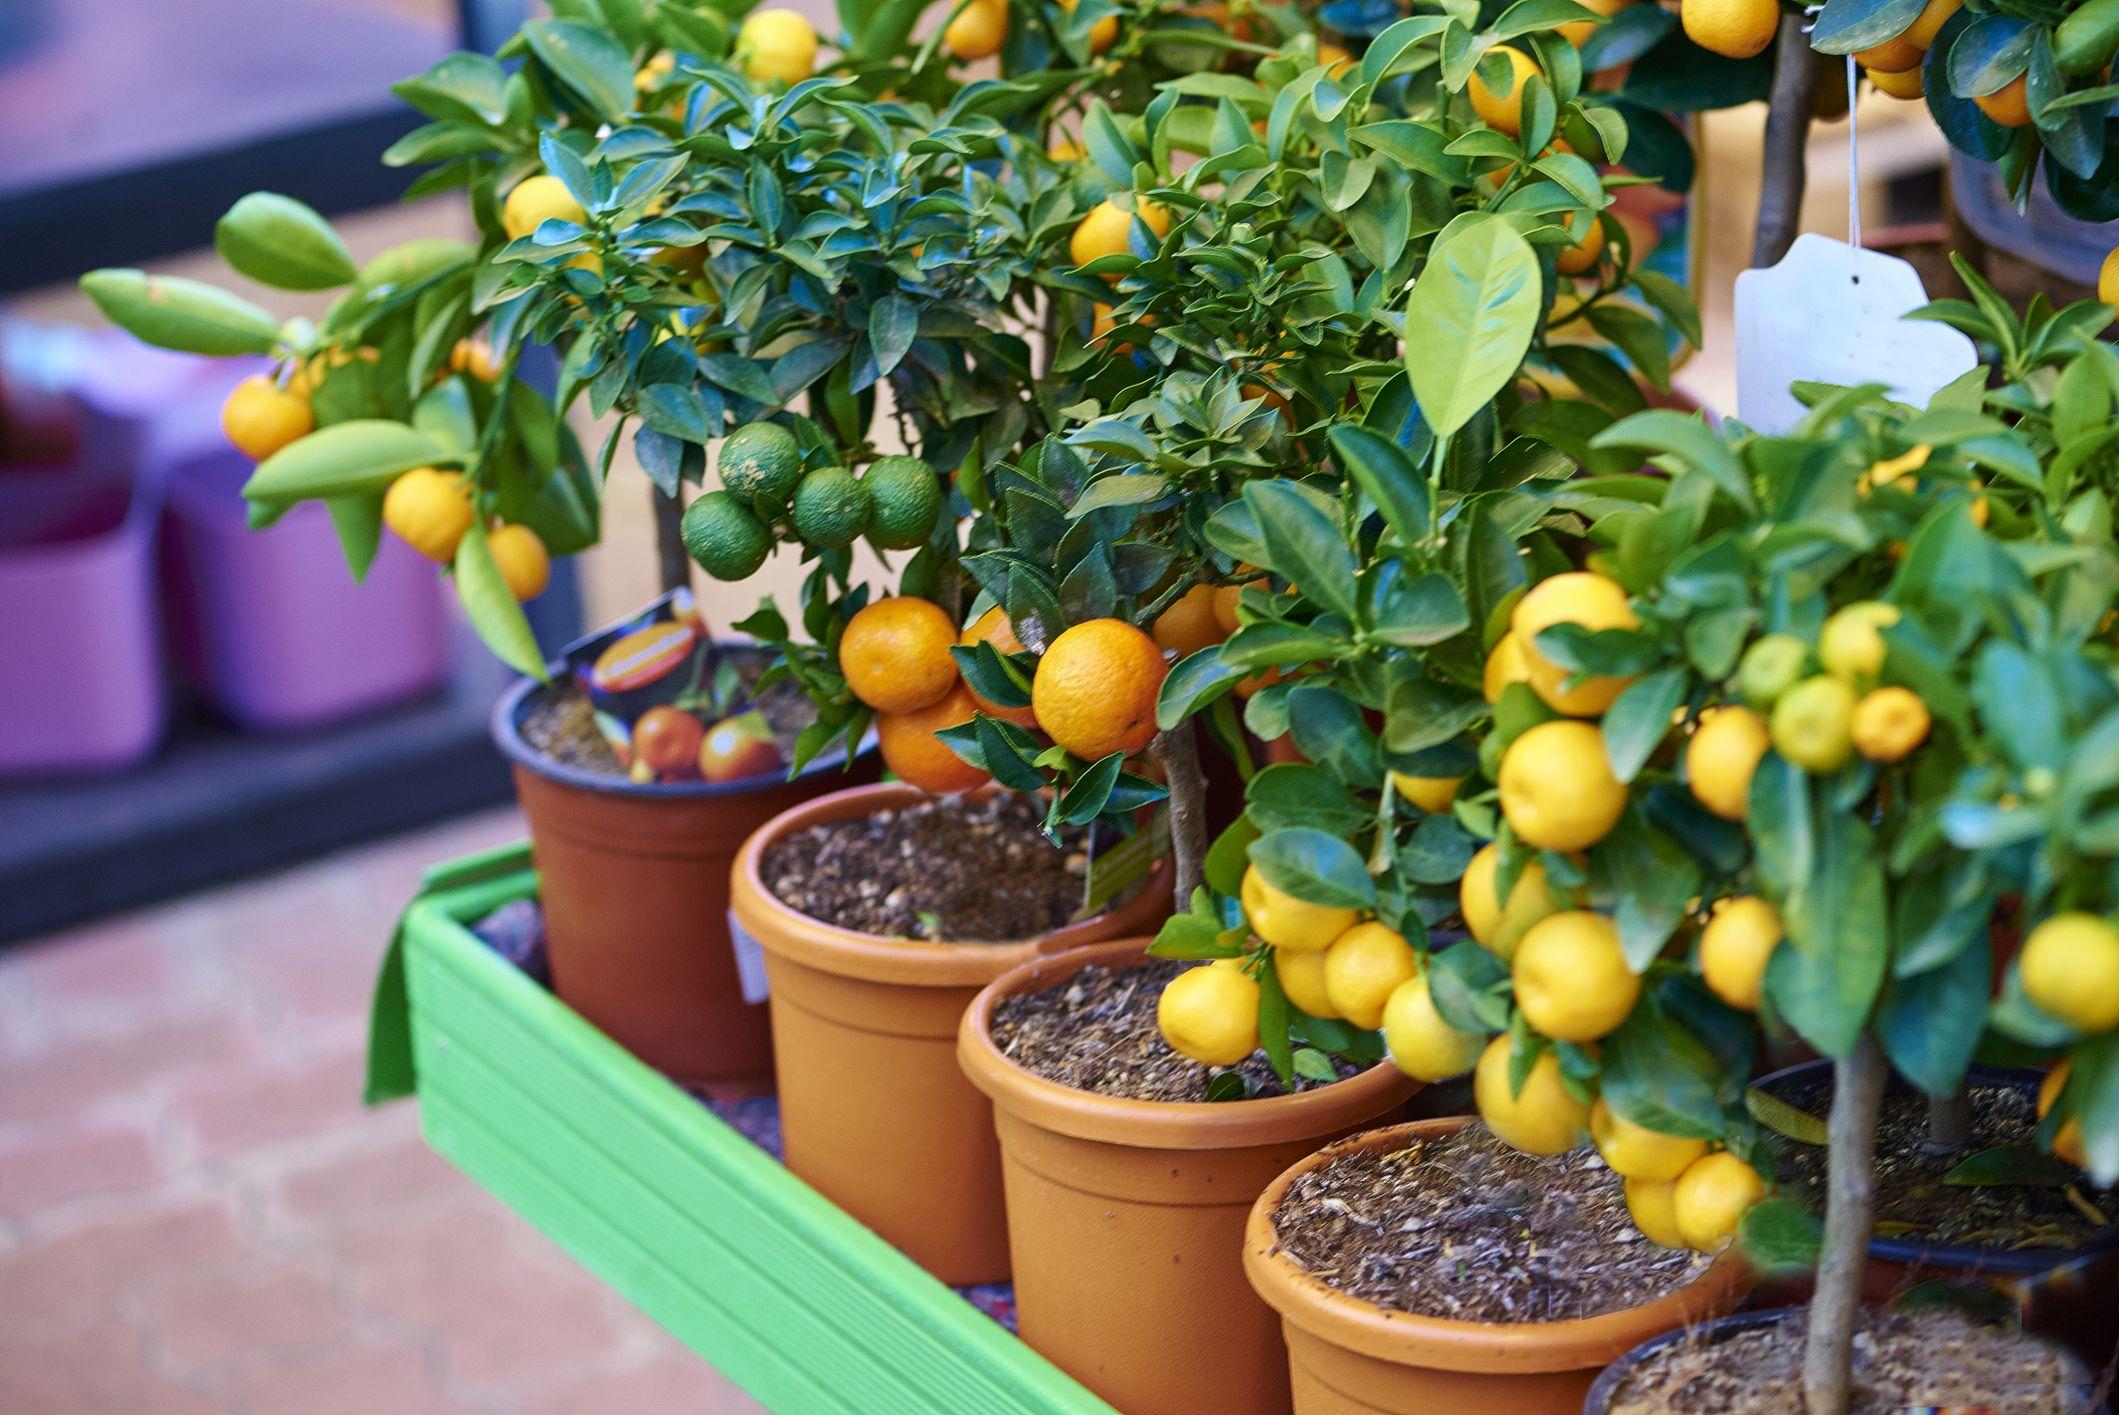 What Is A Dwarf Fruit Tree?